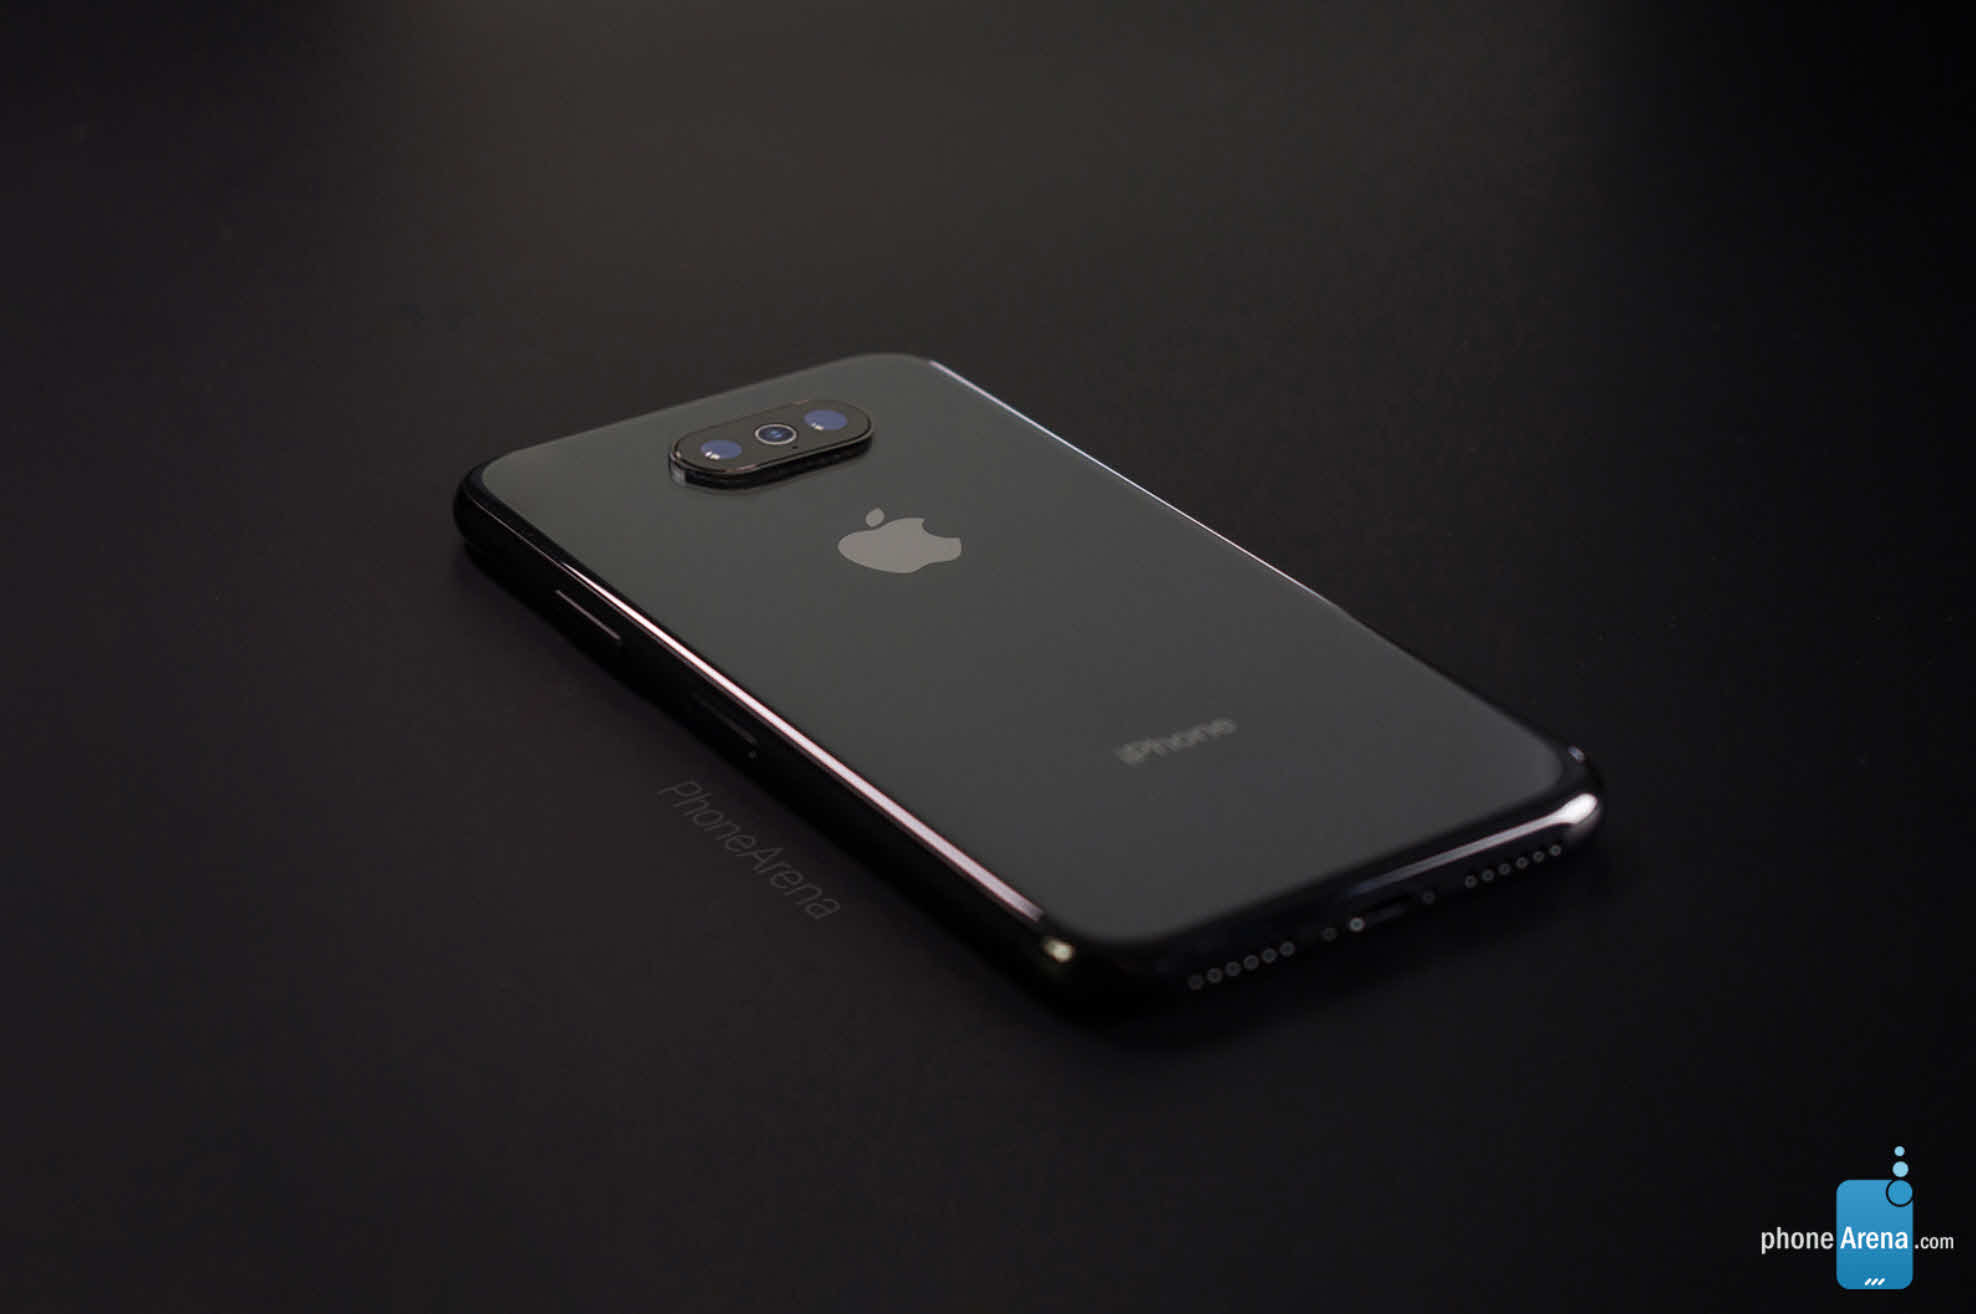 Phonearena Iphone Xi Ios 13 Darkmode Render Img 1 5